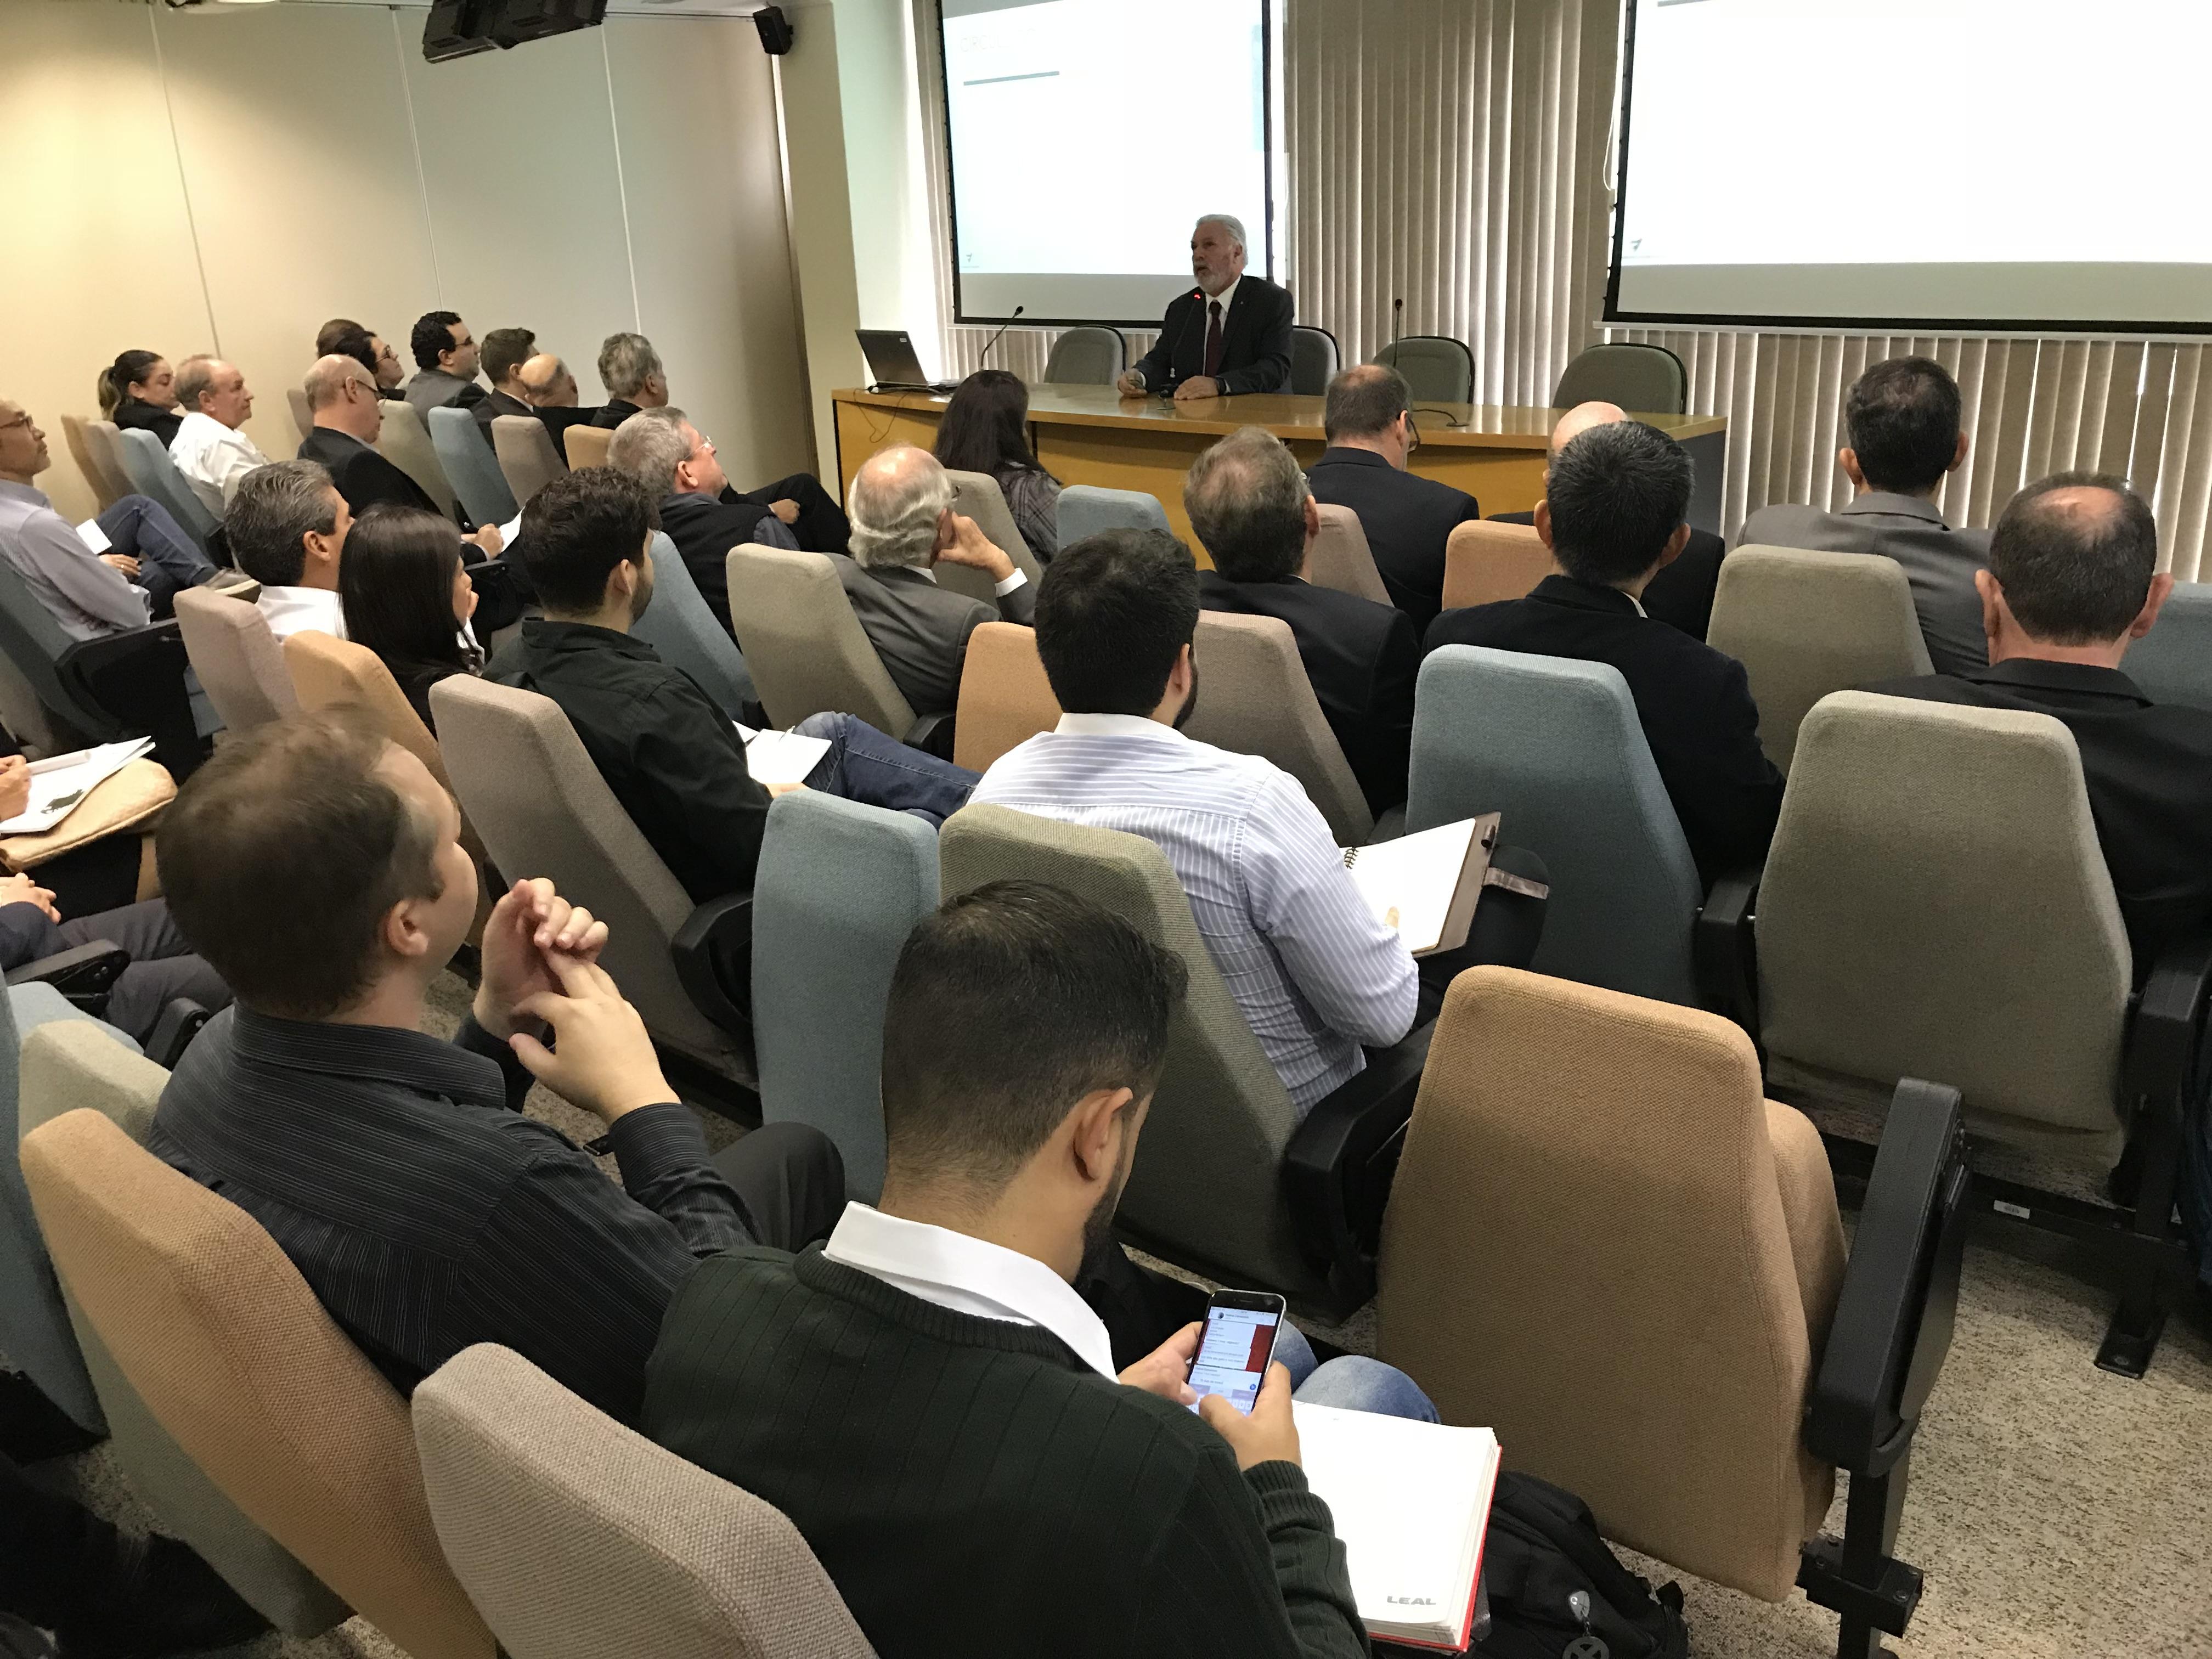 IPD Eletron e Vanzolini promoveram workshop sobre a Indústria 4.0 e oportunidades em PD&I